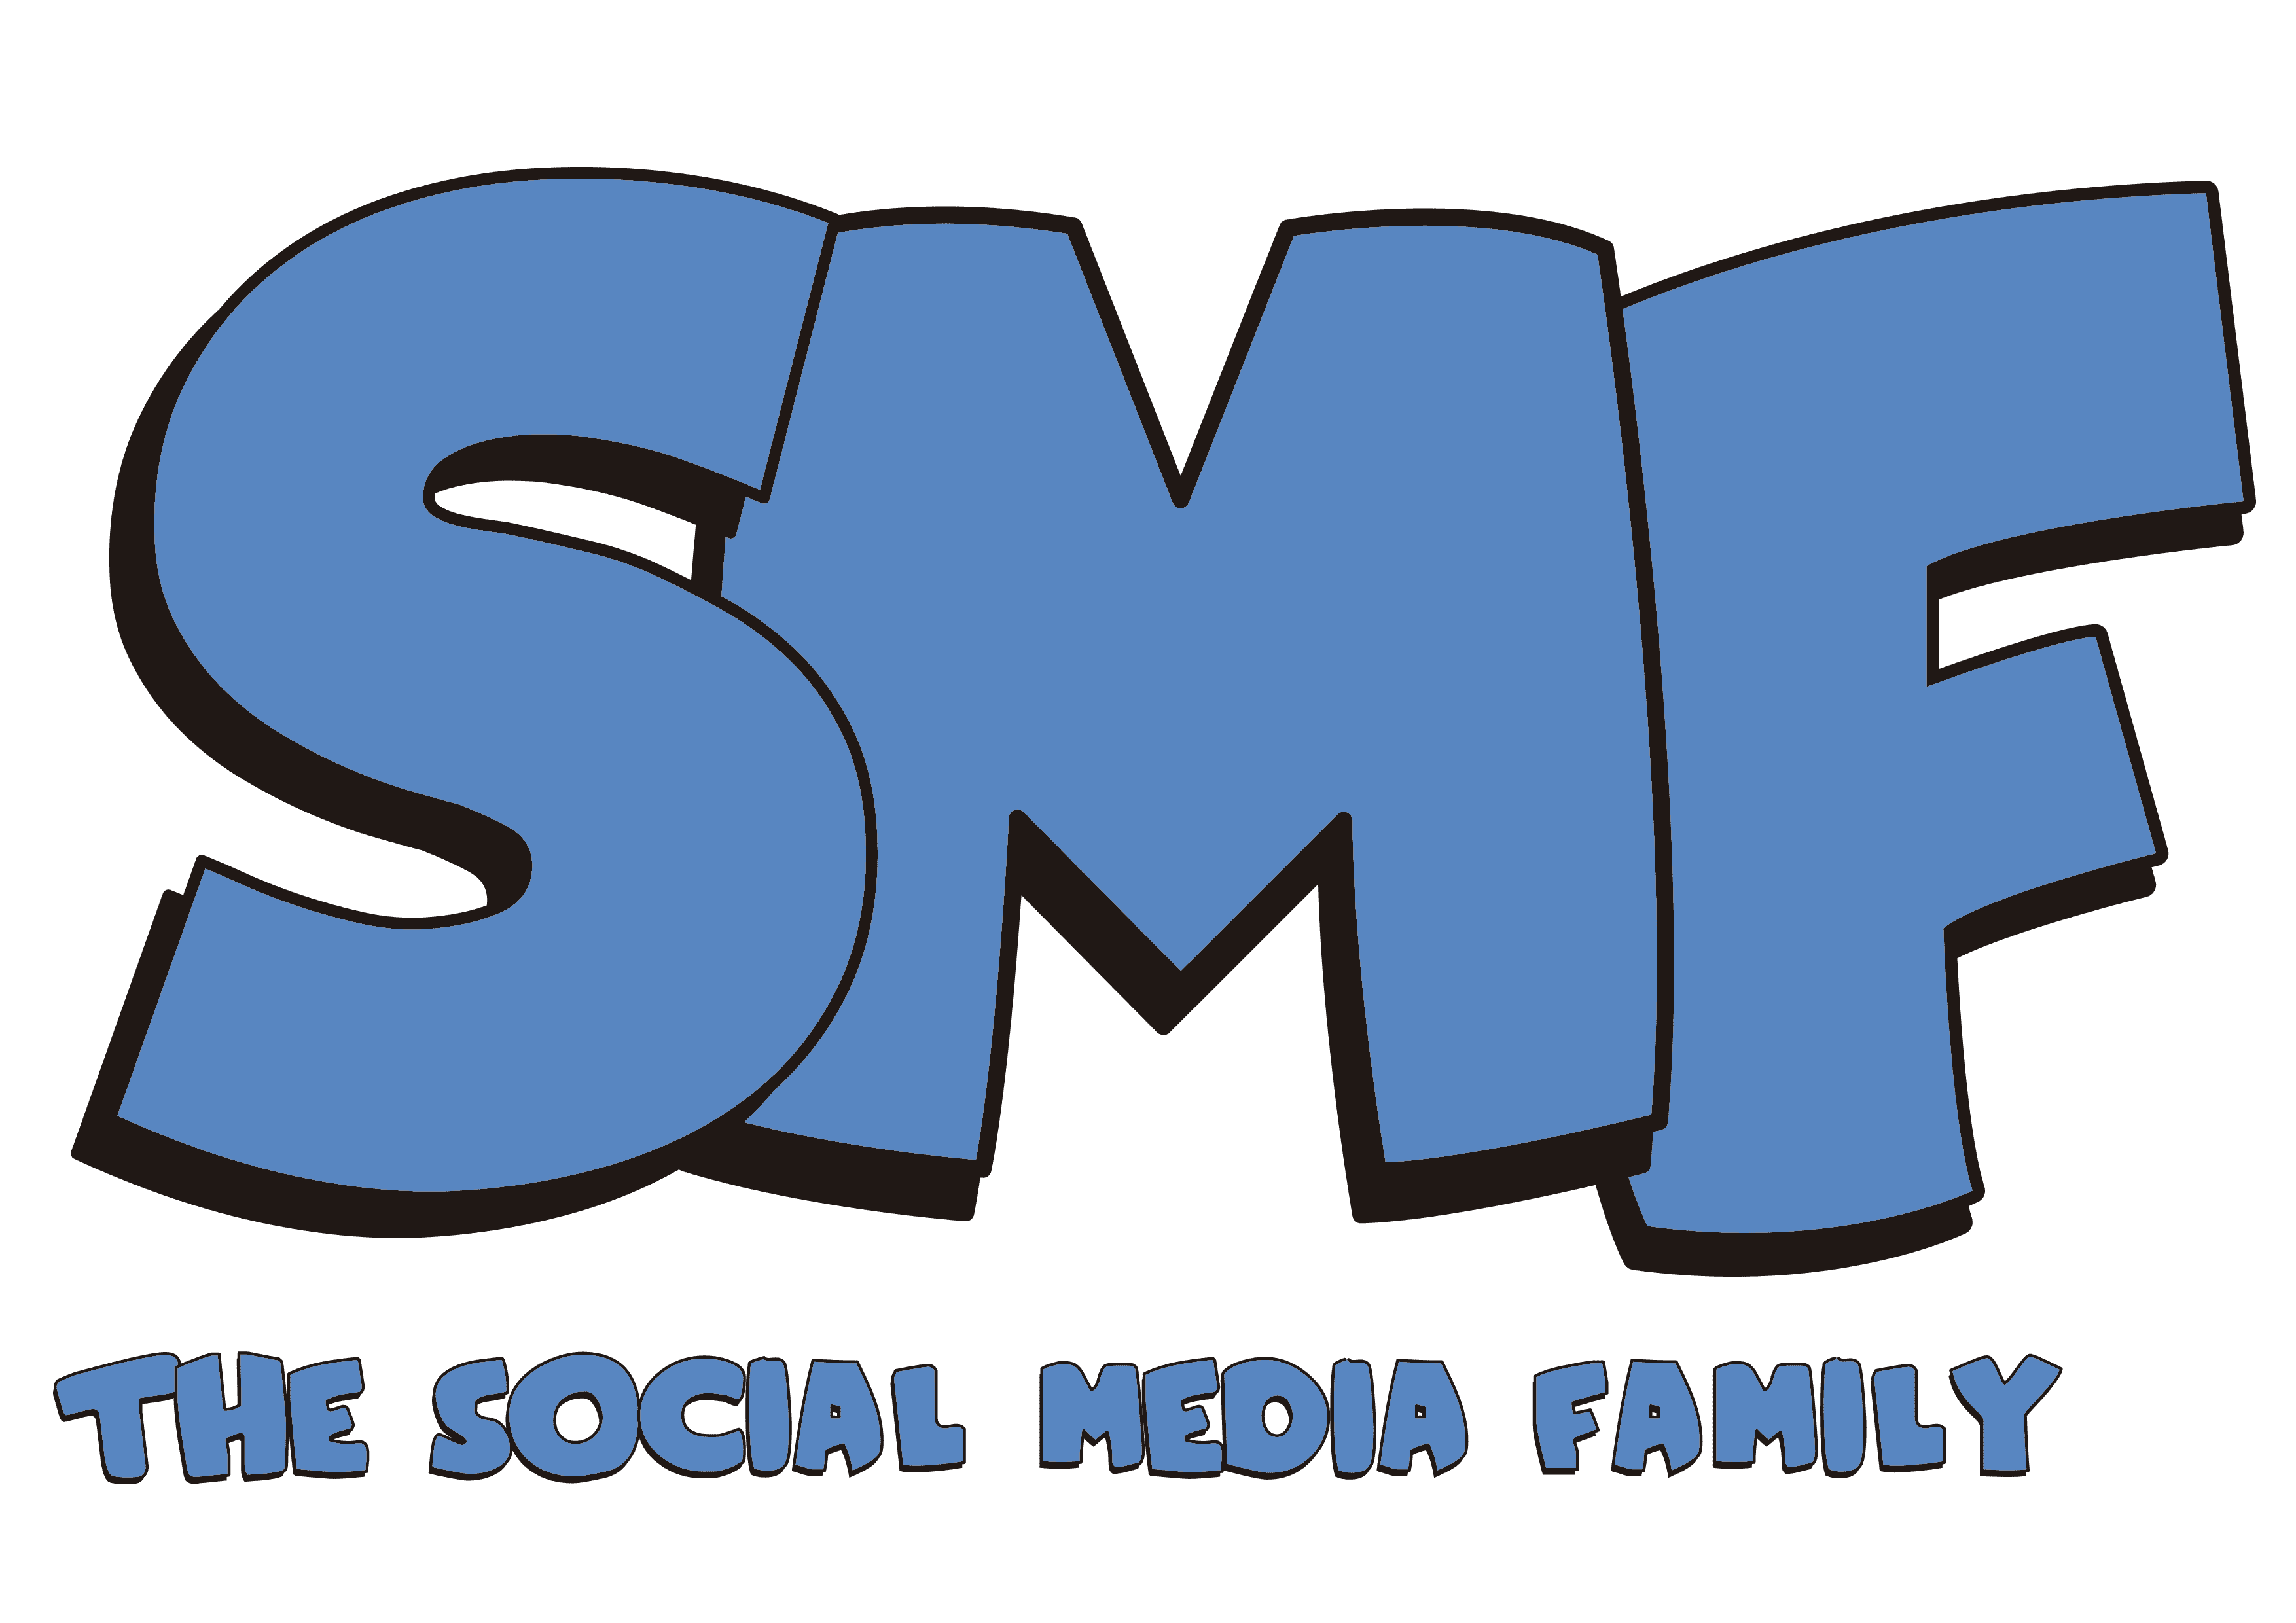 the social media family logo